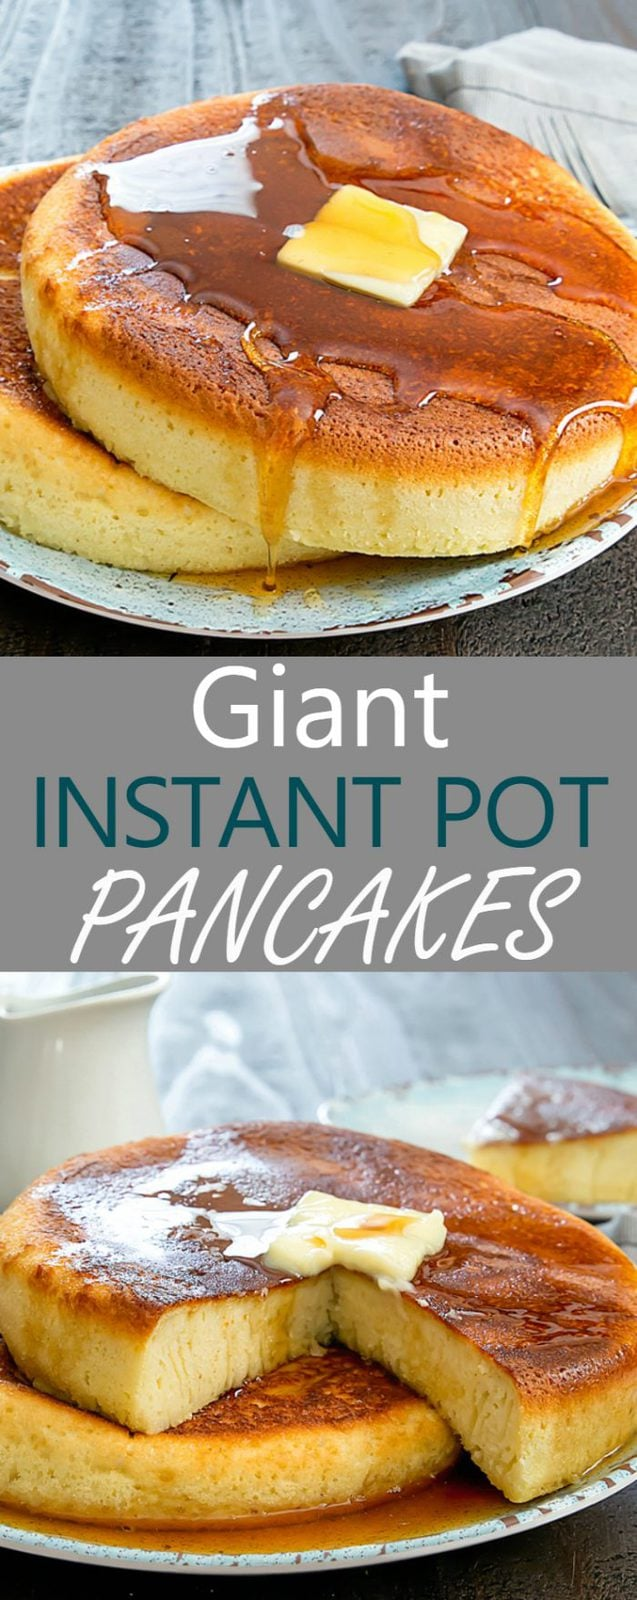 Giant Instant Pot Pancakes